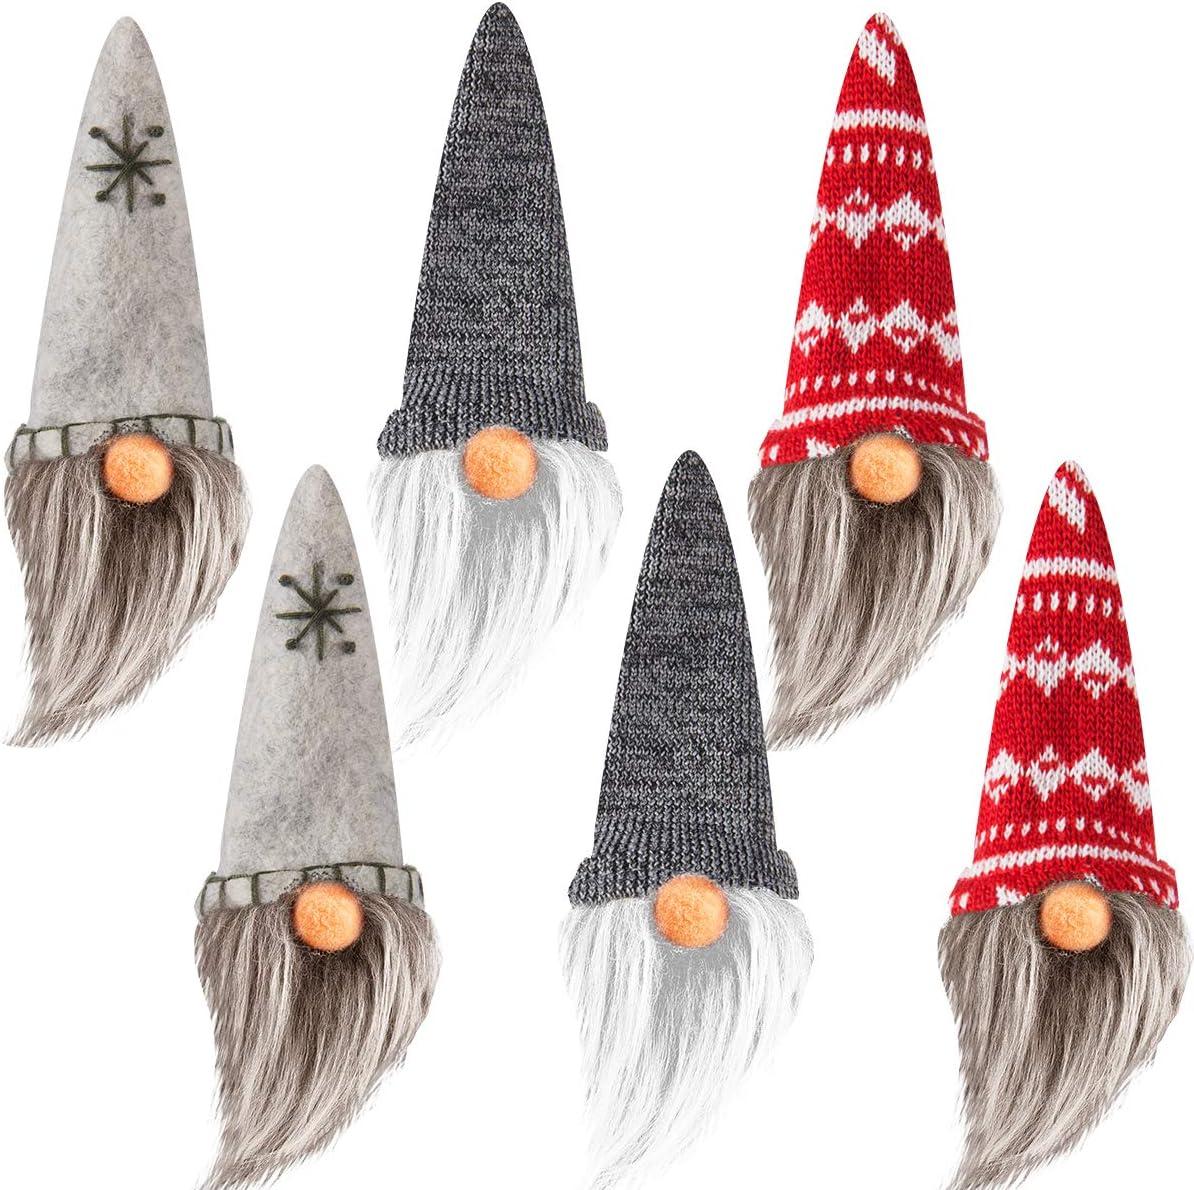 Set of 6 Handmade Swedish Tomte- Christmas Elf Gnome Scandinavian Santa Gnome Plush Christmas Tree Hanging Ornament Figurines for Home Holiday Decorations Xmas Present